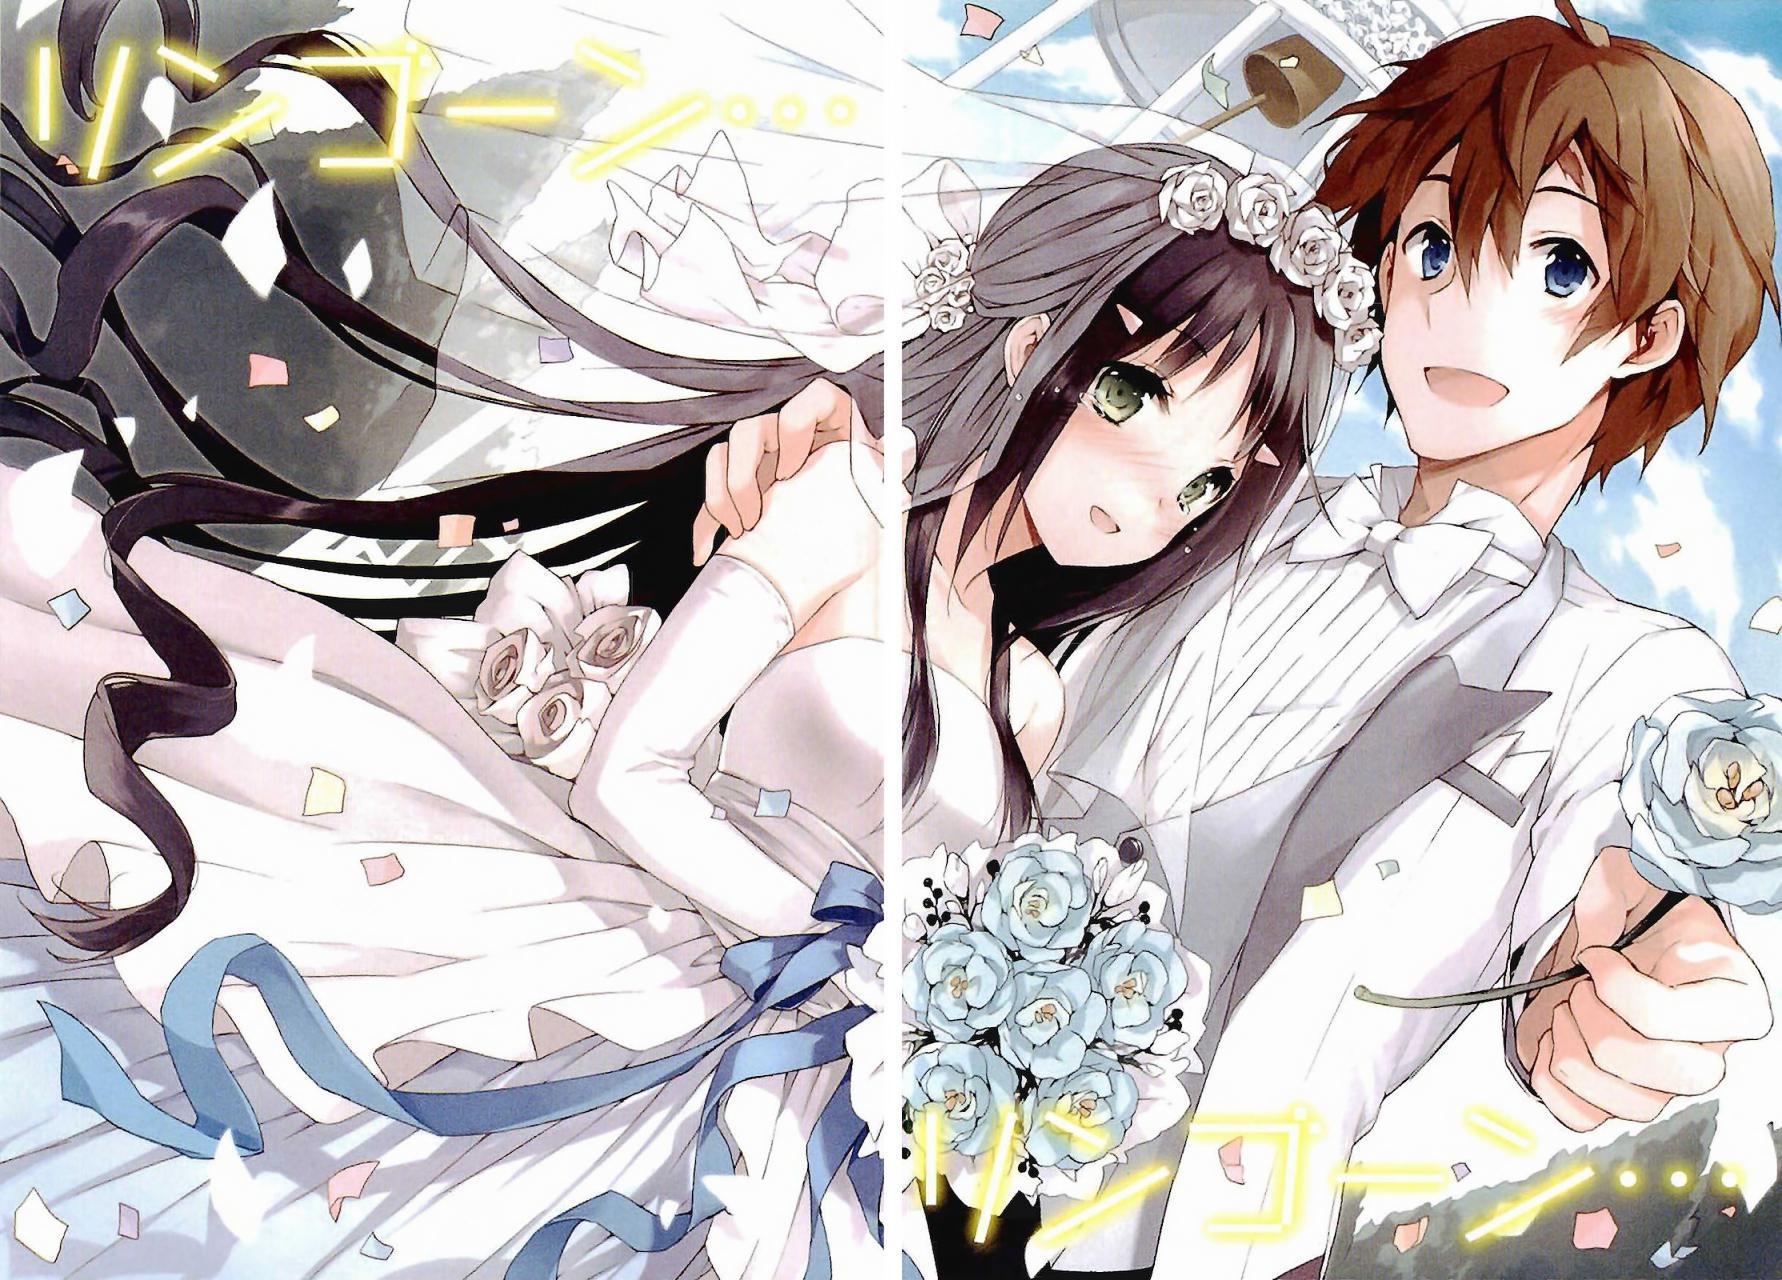 Anime Wedding Wallpapers - Top Free Anime Wedding Backgrounds